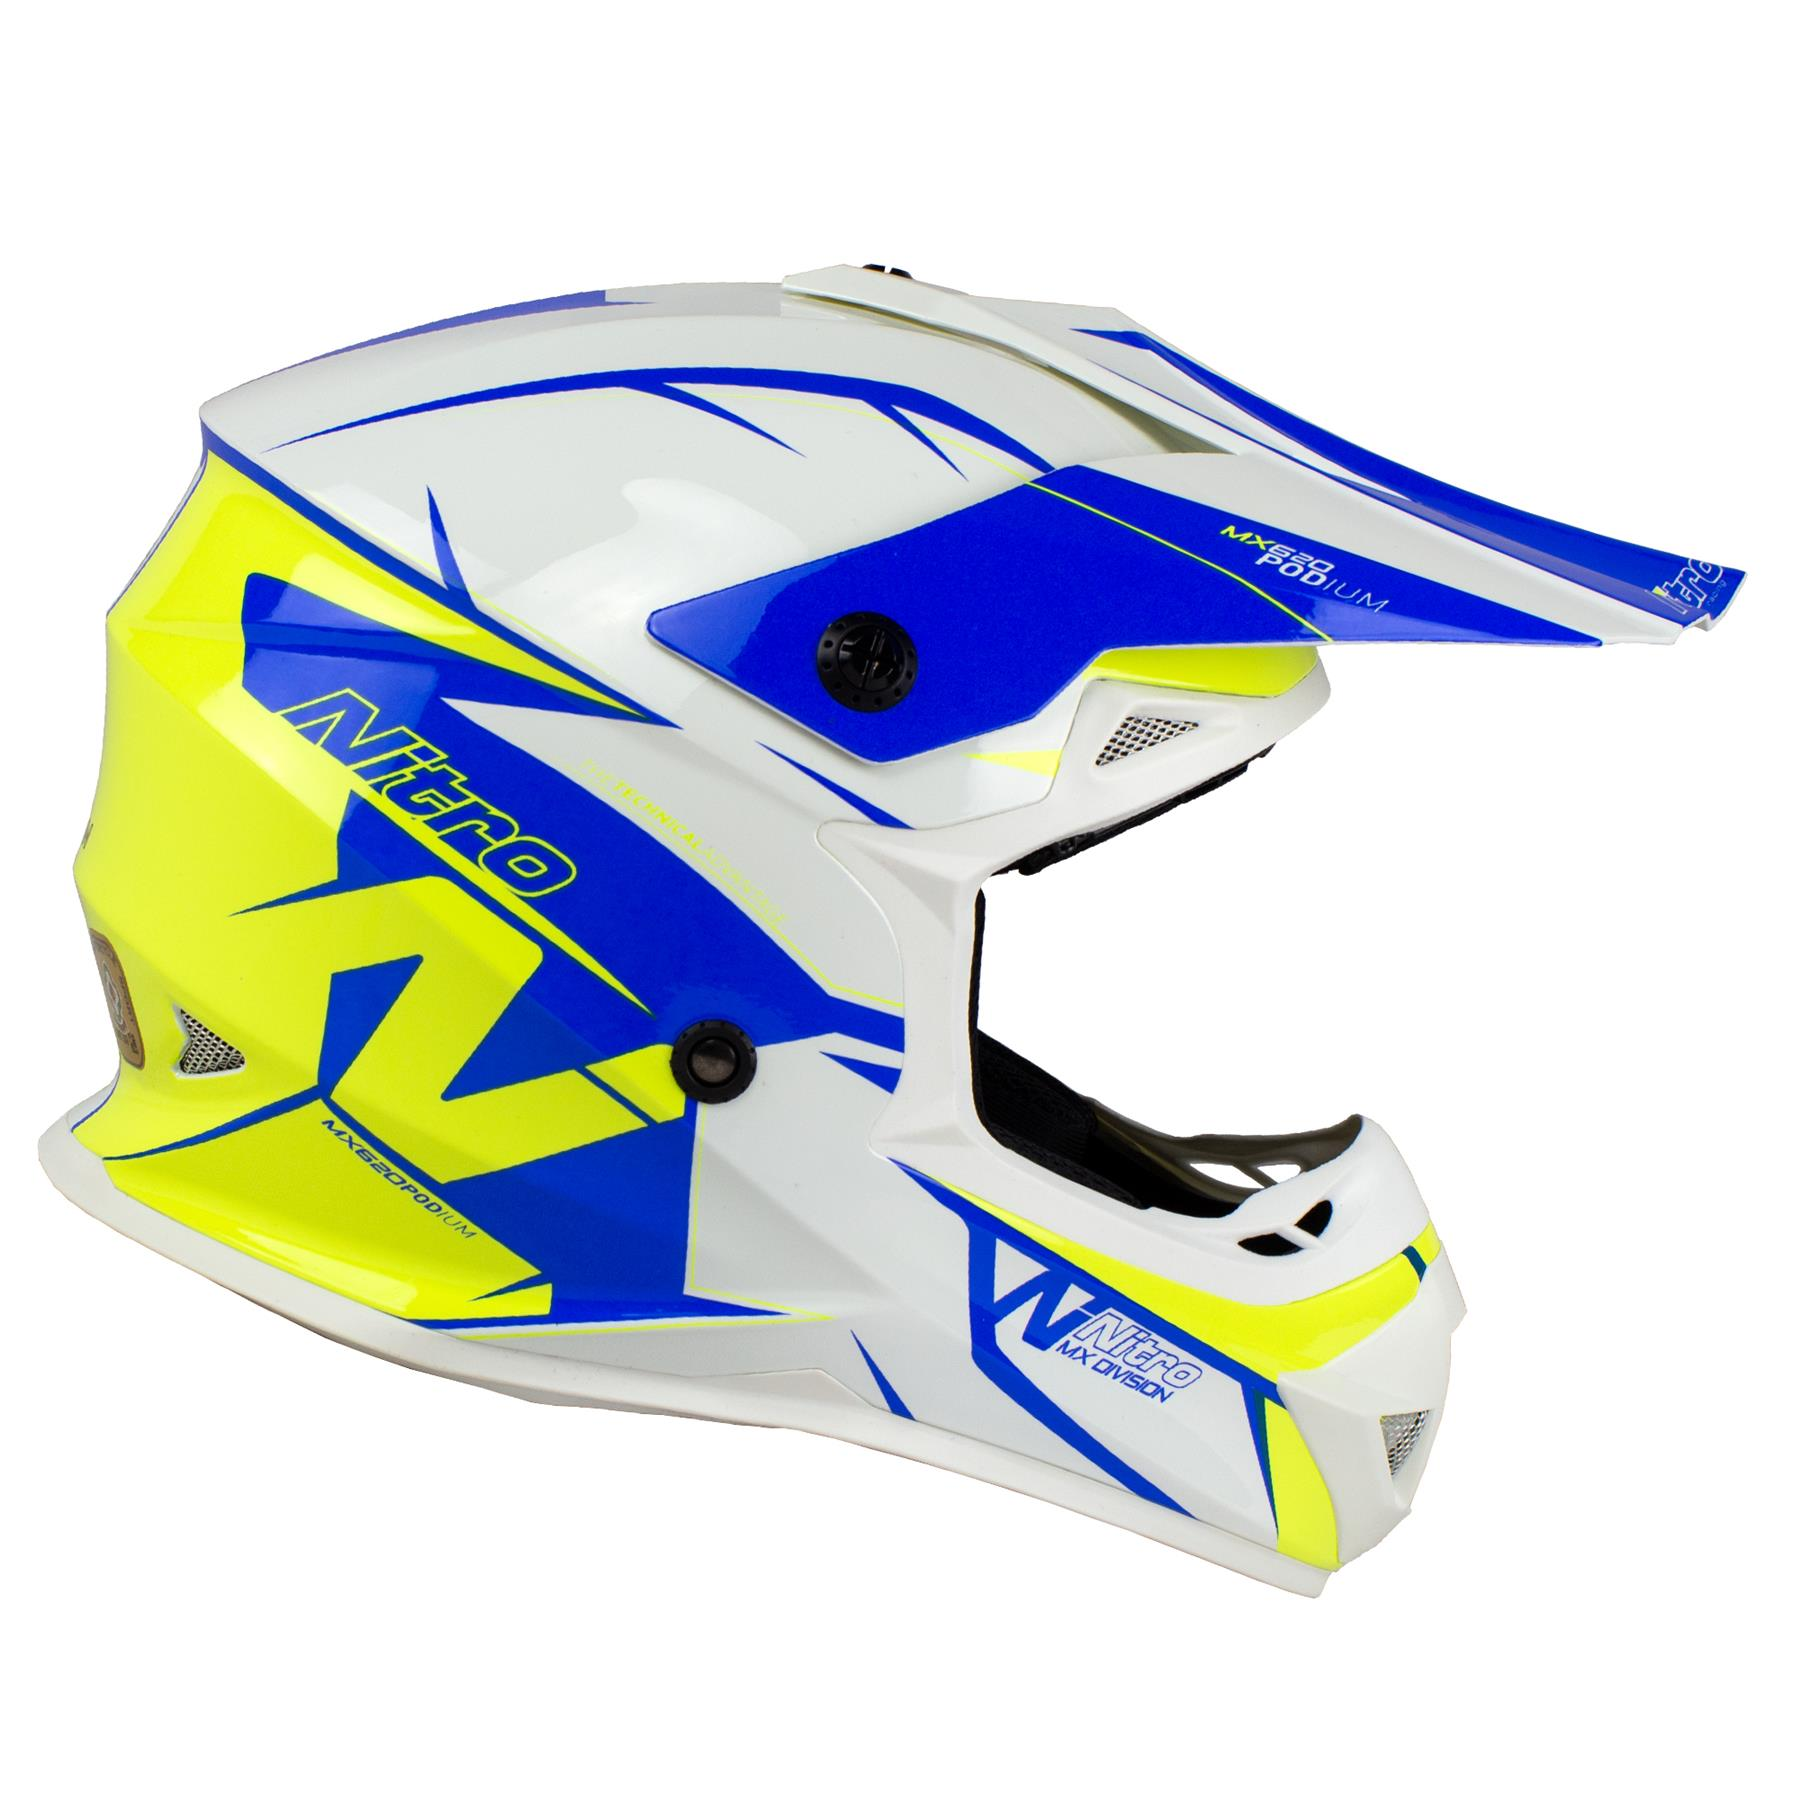 Nitro-MX620-Podium-MX-Motorcross-Motorcycle-Helmet-ATV-Enduro-ACU-Adult-Youth thumbnail 38